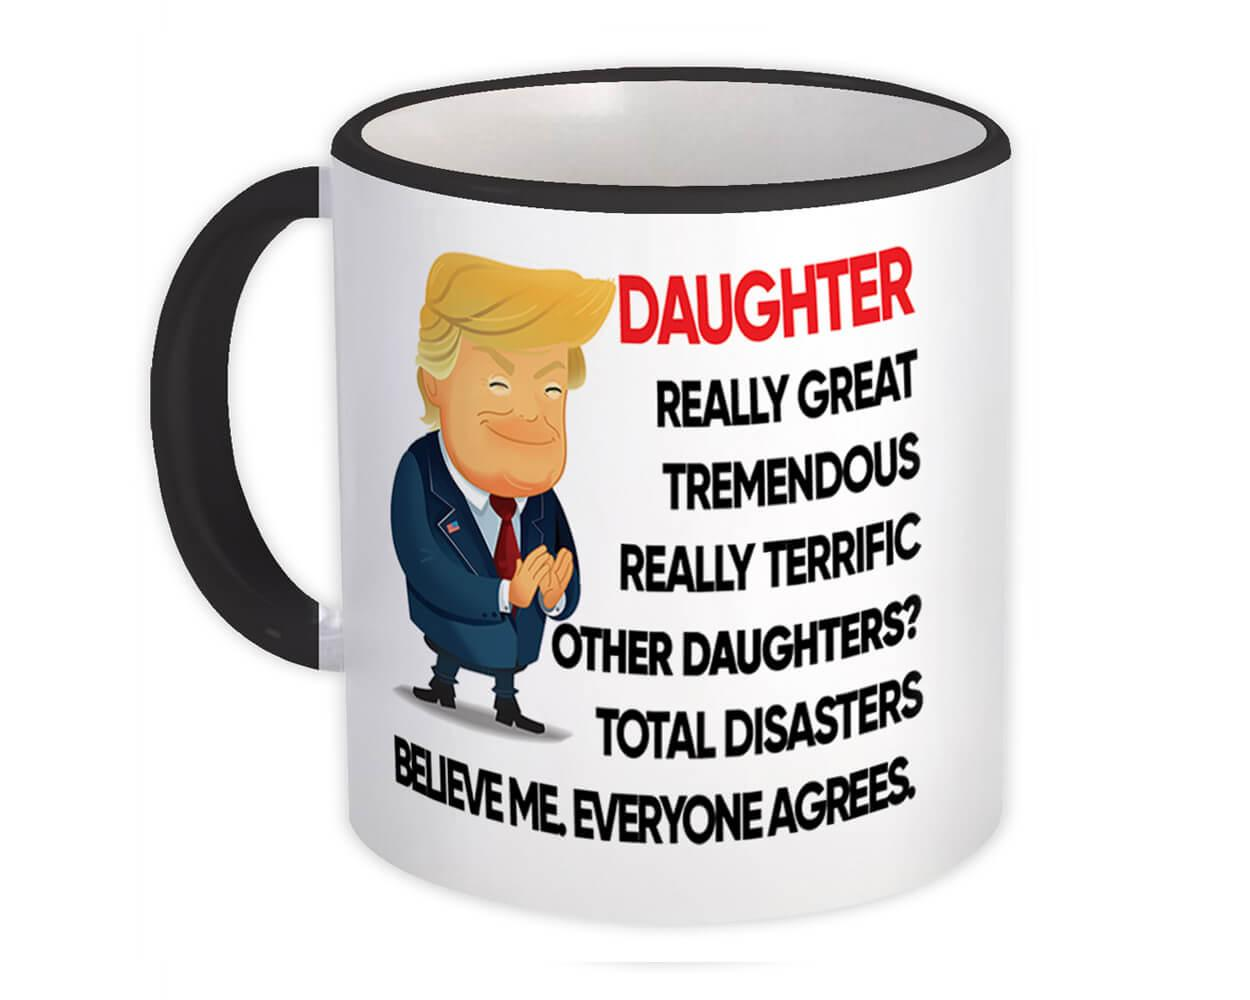 Gift for DAUGHTER : Gift Mug Donald Trump Terrific DAUGHTER Funny Christmas